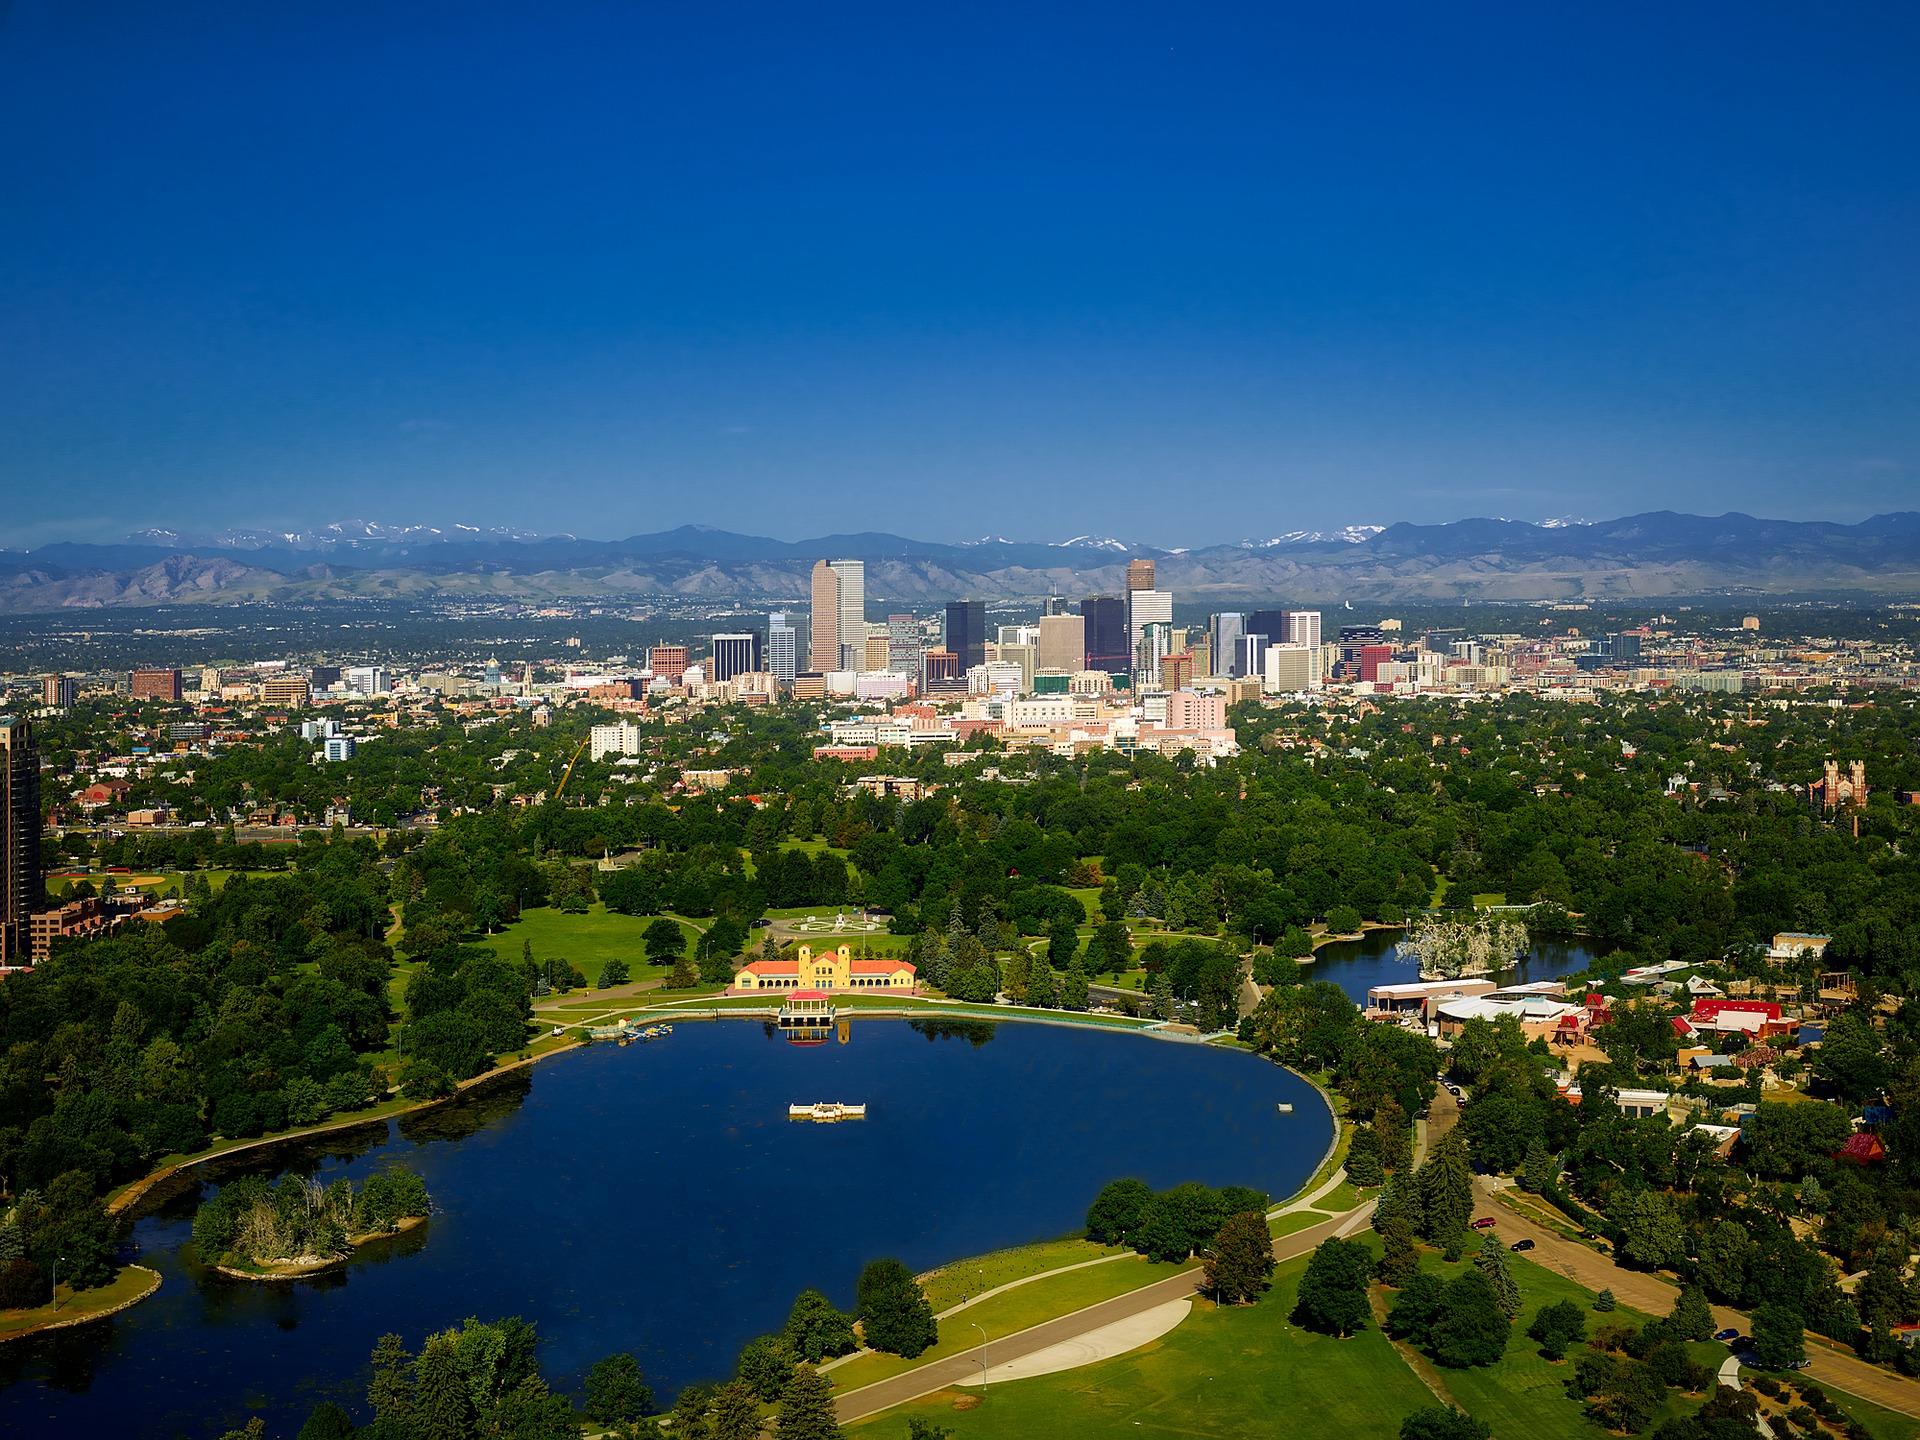 MaxPixel.freegreatpicture.com-Urban-City-Colorado-Denver-Skyline-Mountains-2228783.jpg